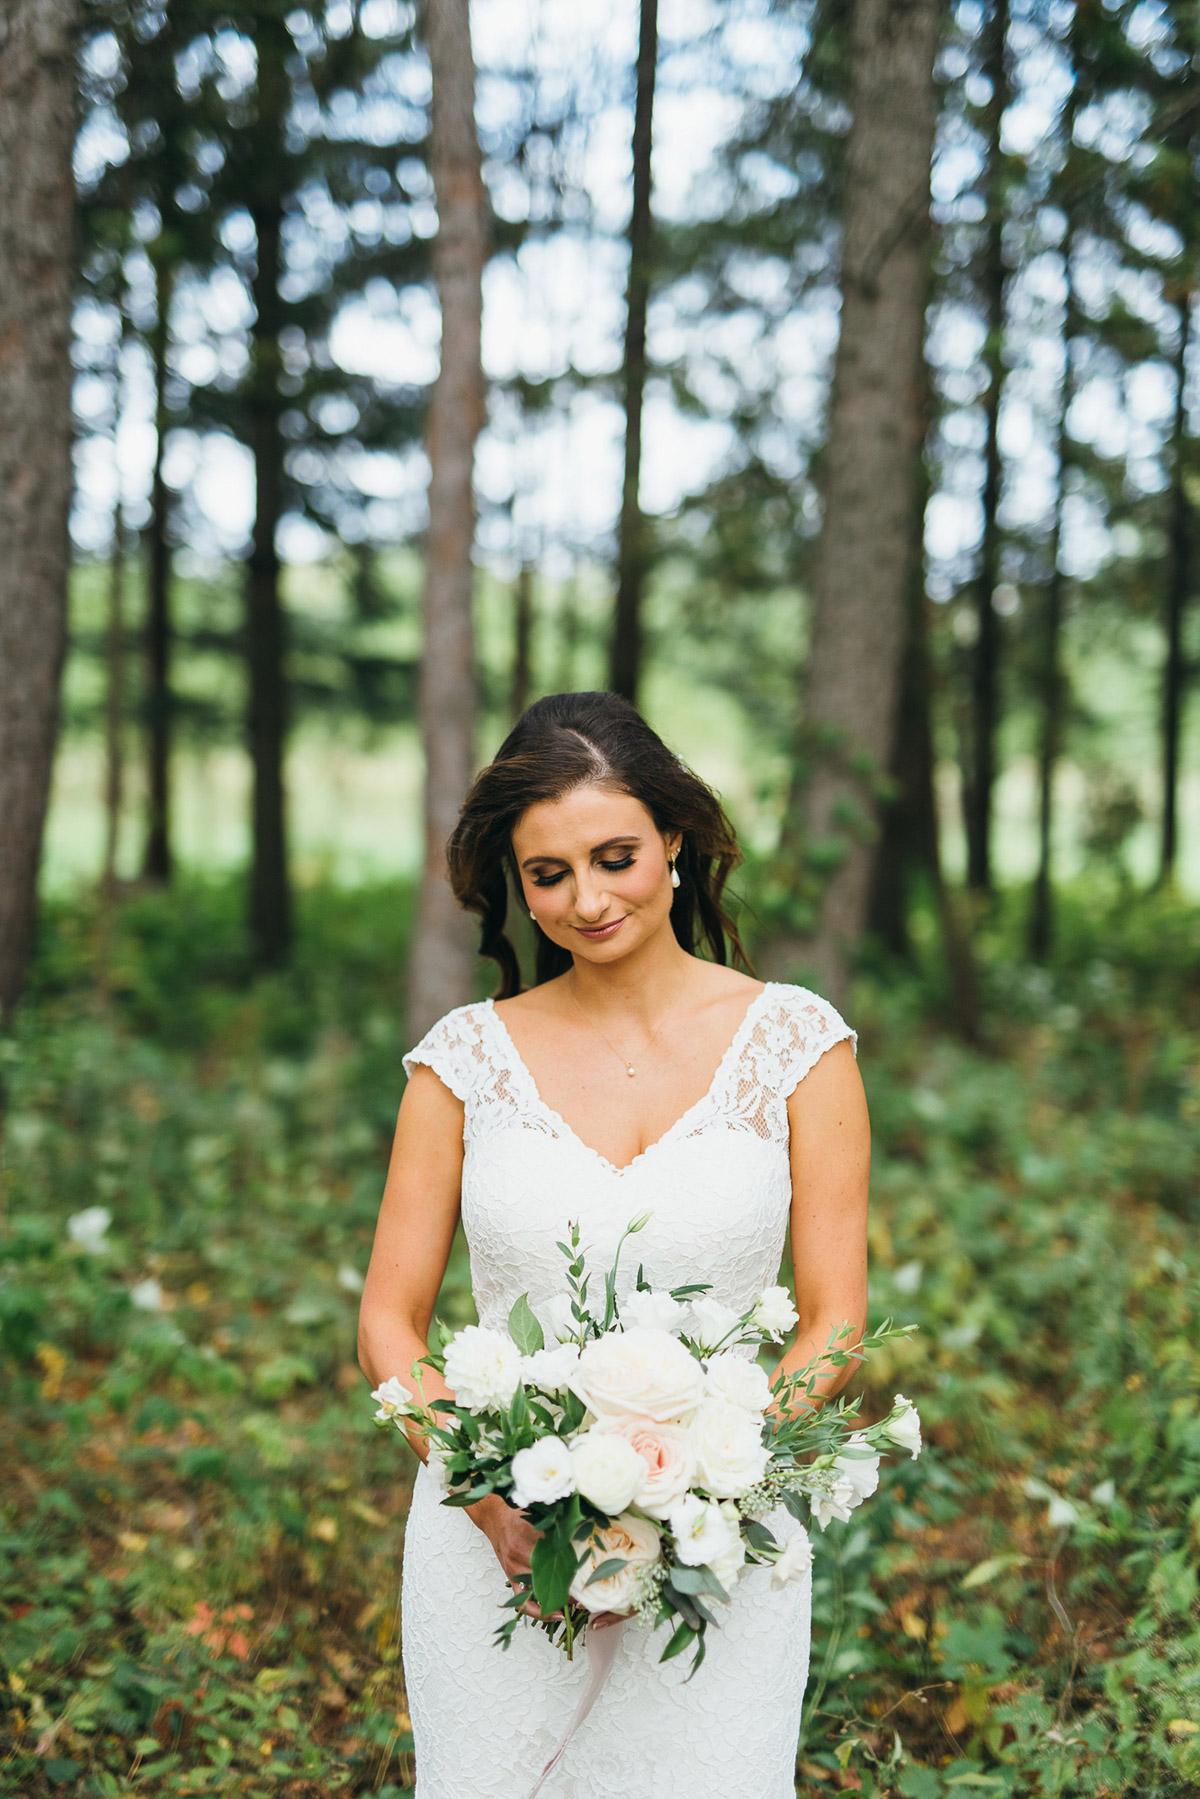 shaw-events-vineyard-bride-swish-list-kurtz-orchards-niagara-on-the-lake-wedding-75.jpg